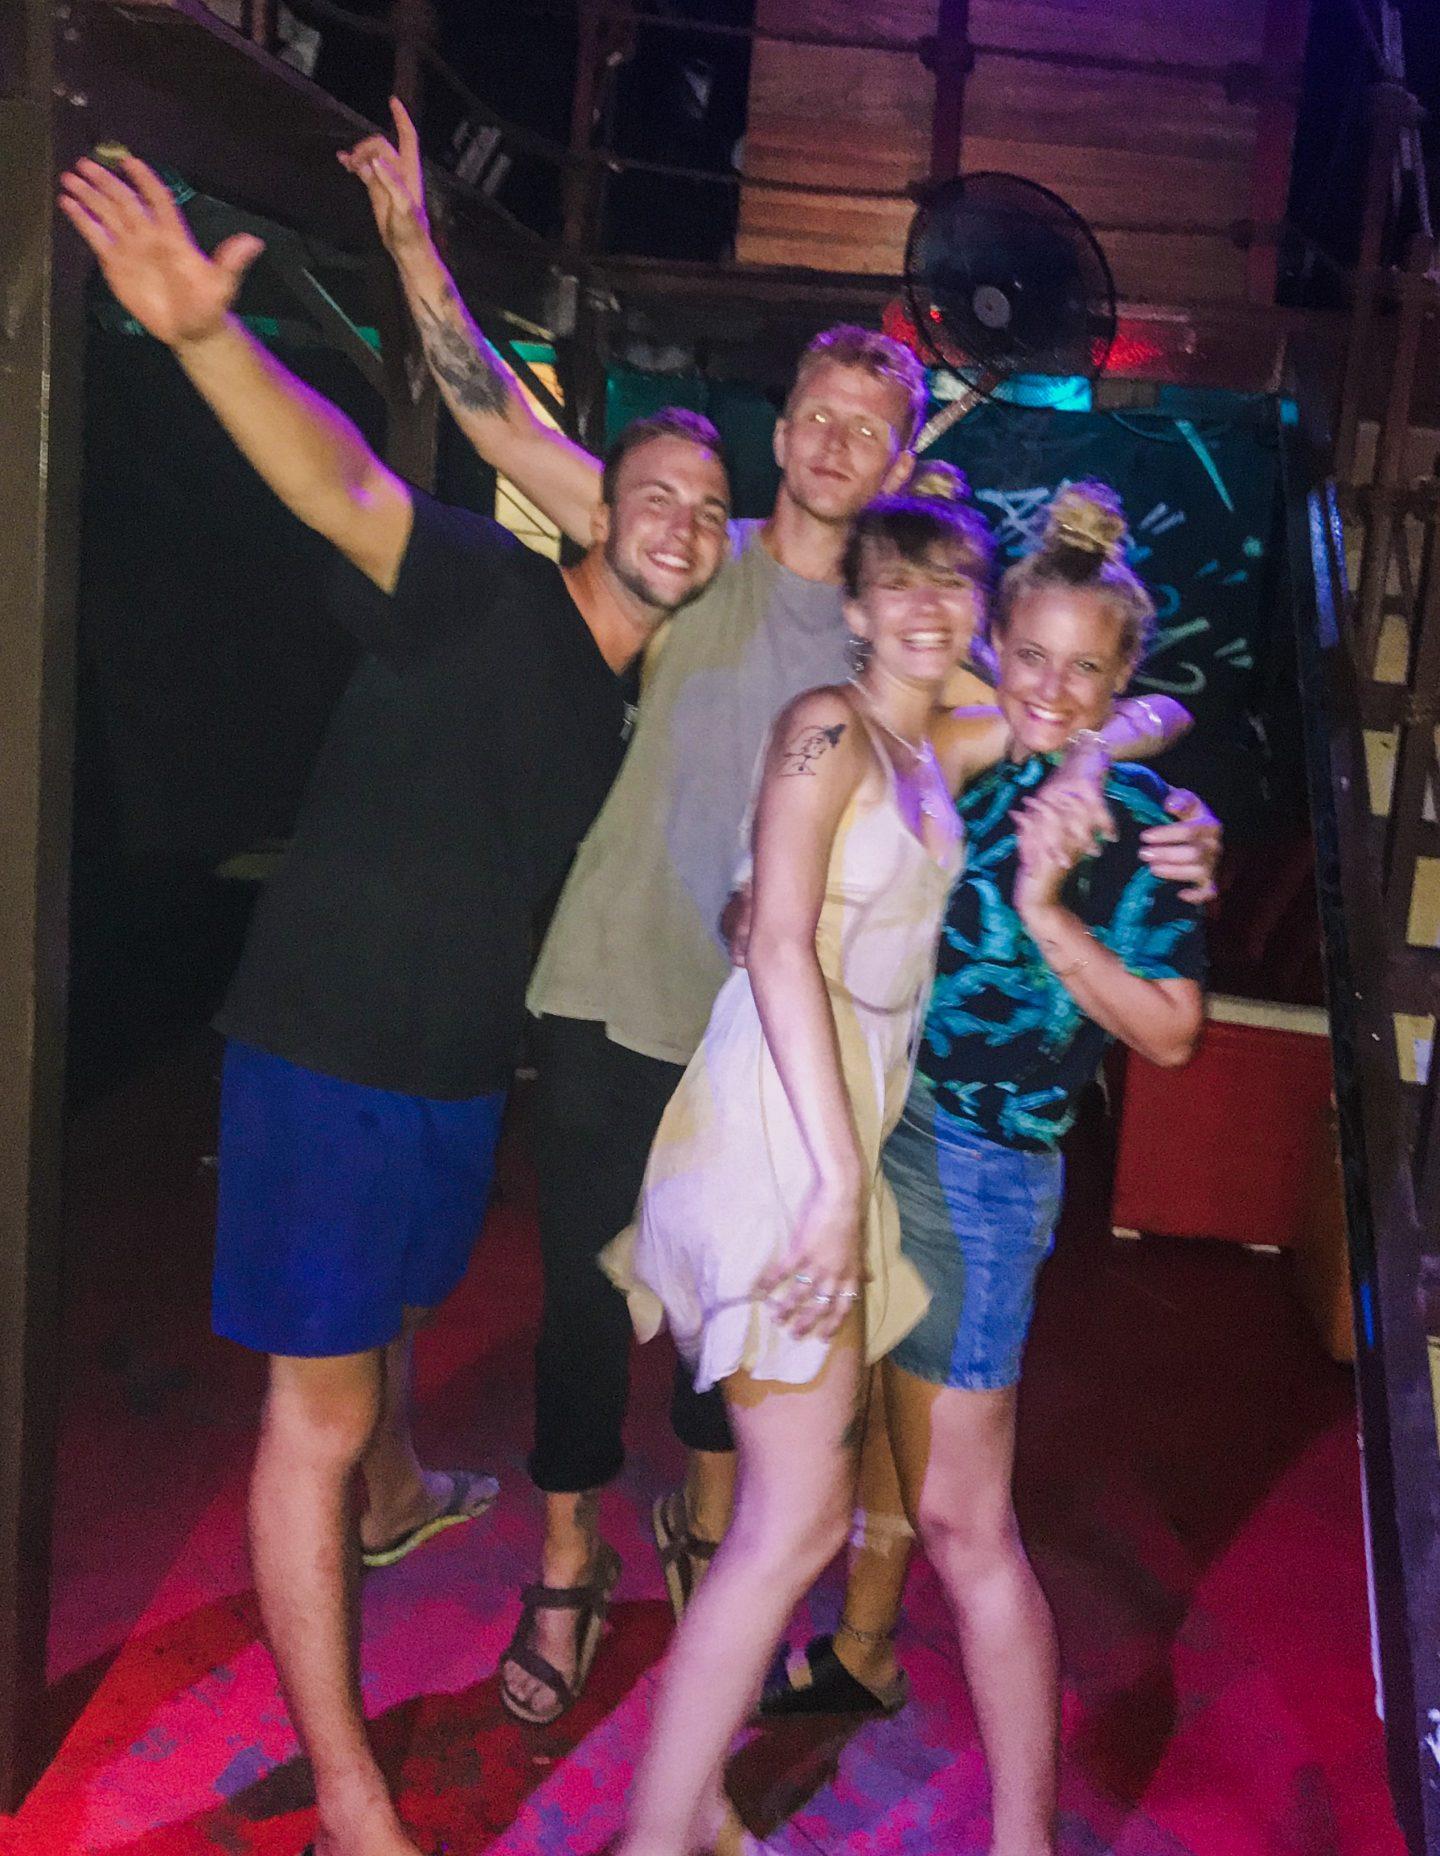 Emma, George, Thijs and I